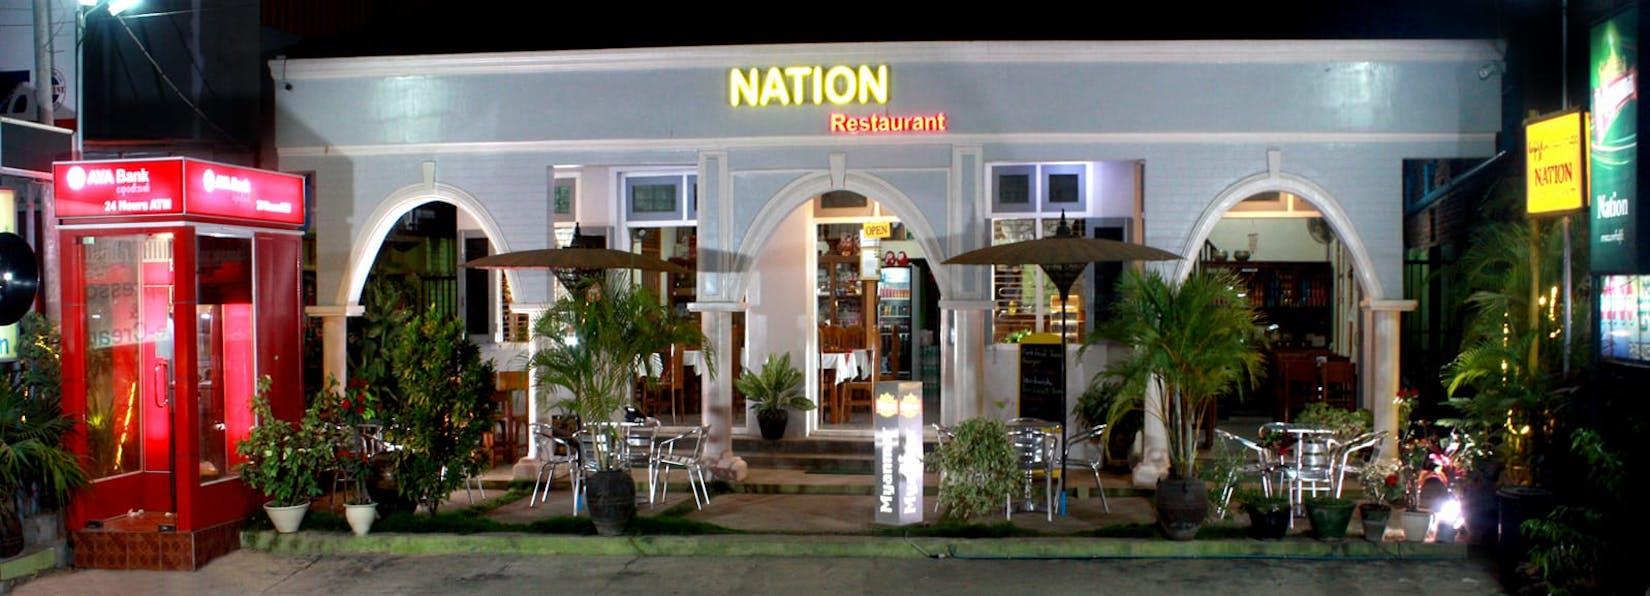 Nation Cafe & Restaurant | yathar